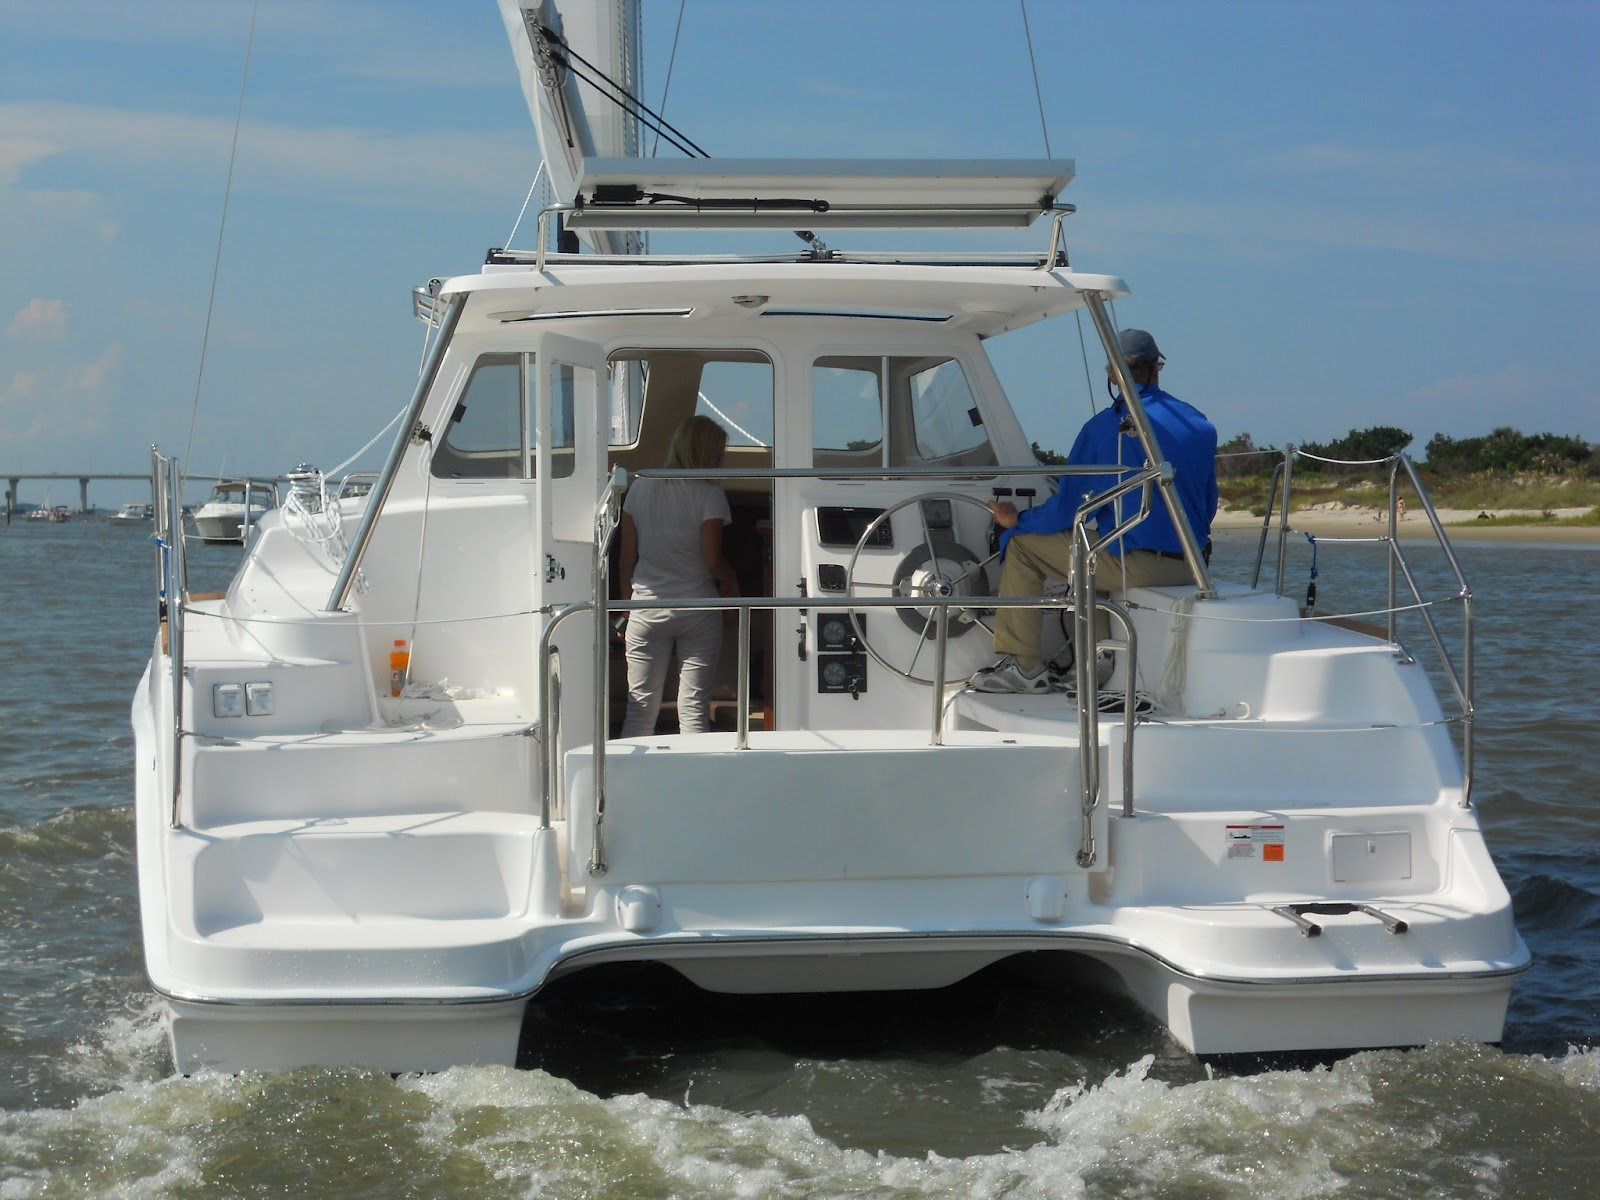 Catamarans For Sale: Catamarans For Sale Craigslist